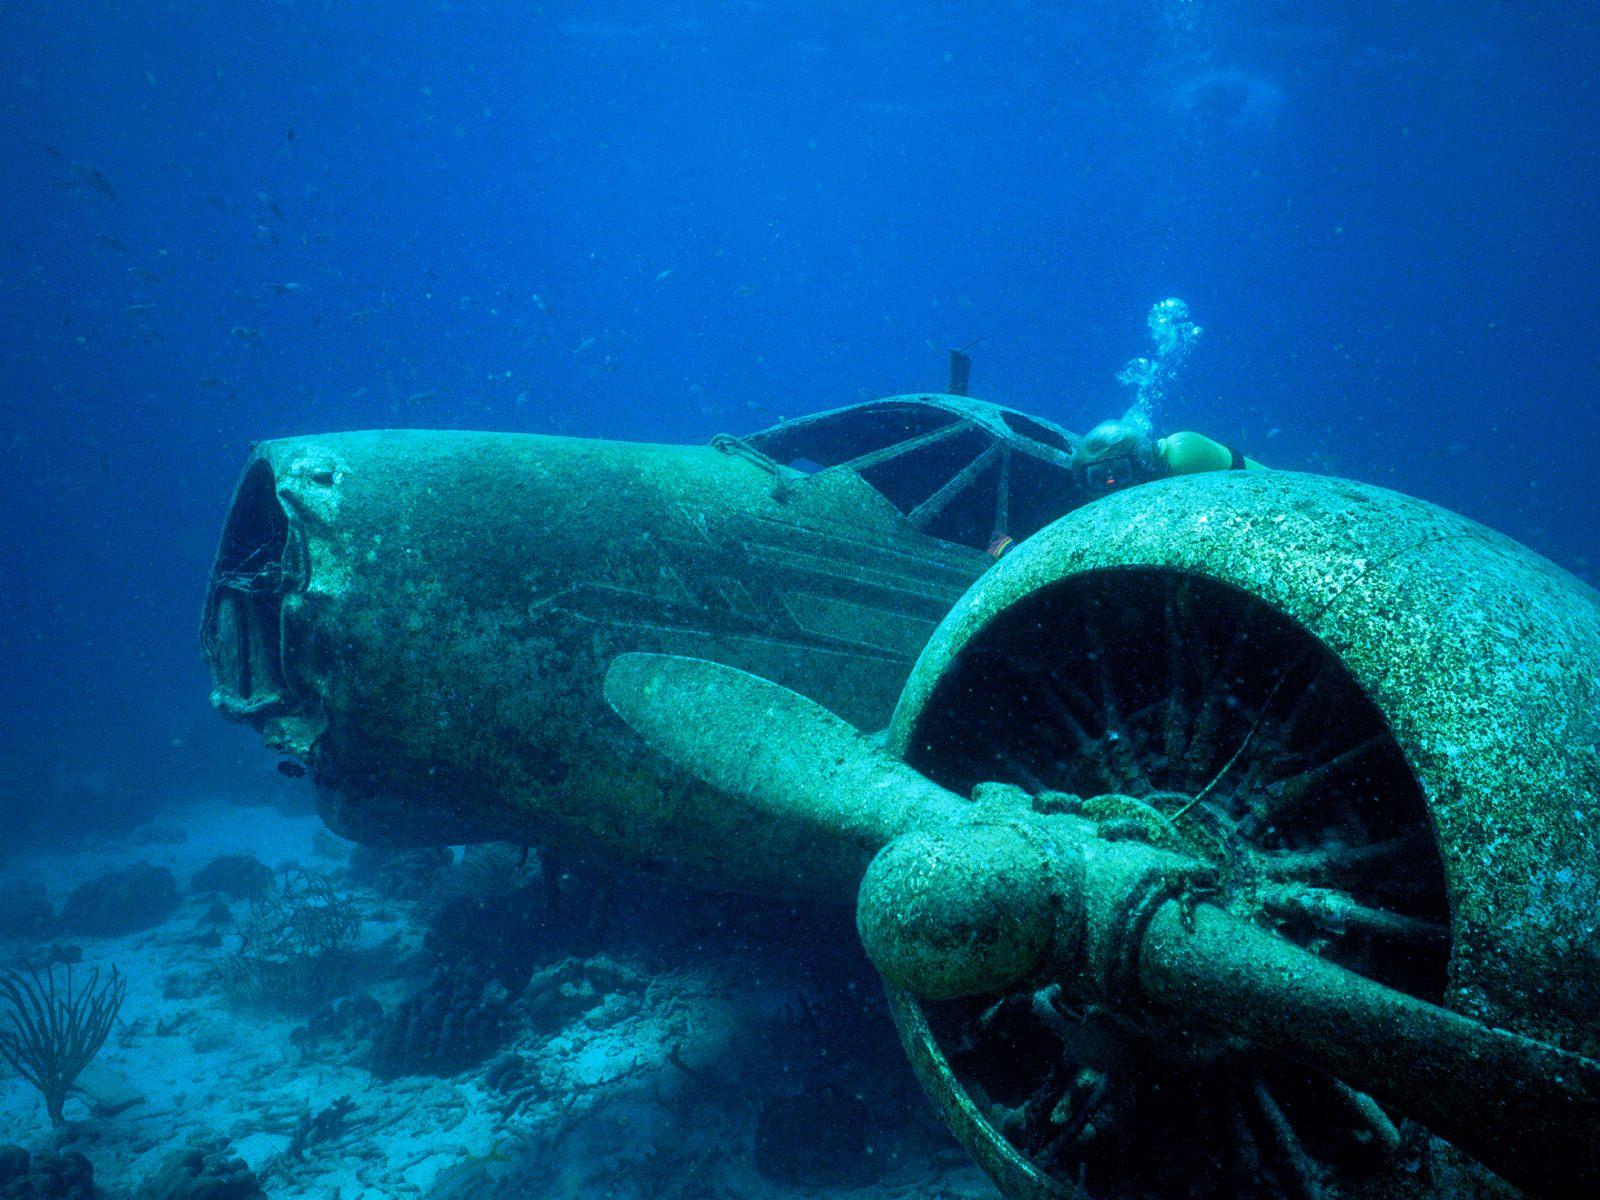 airplanes-crash-wrecks-underwater-airplane-wreck-diving-disaster